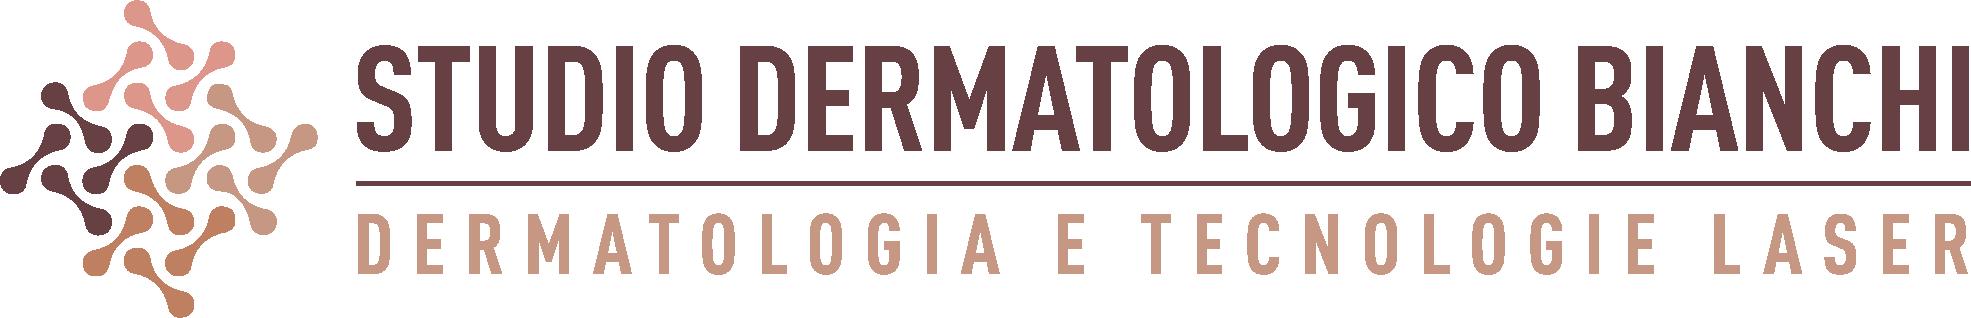 Studio Dermatologico Bianchi